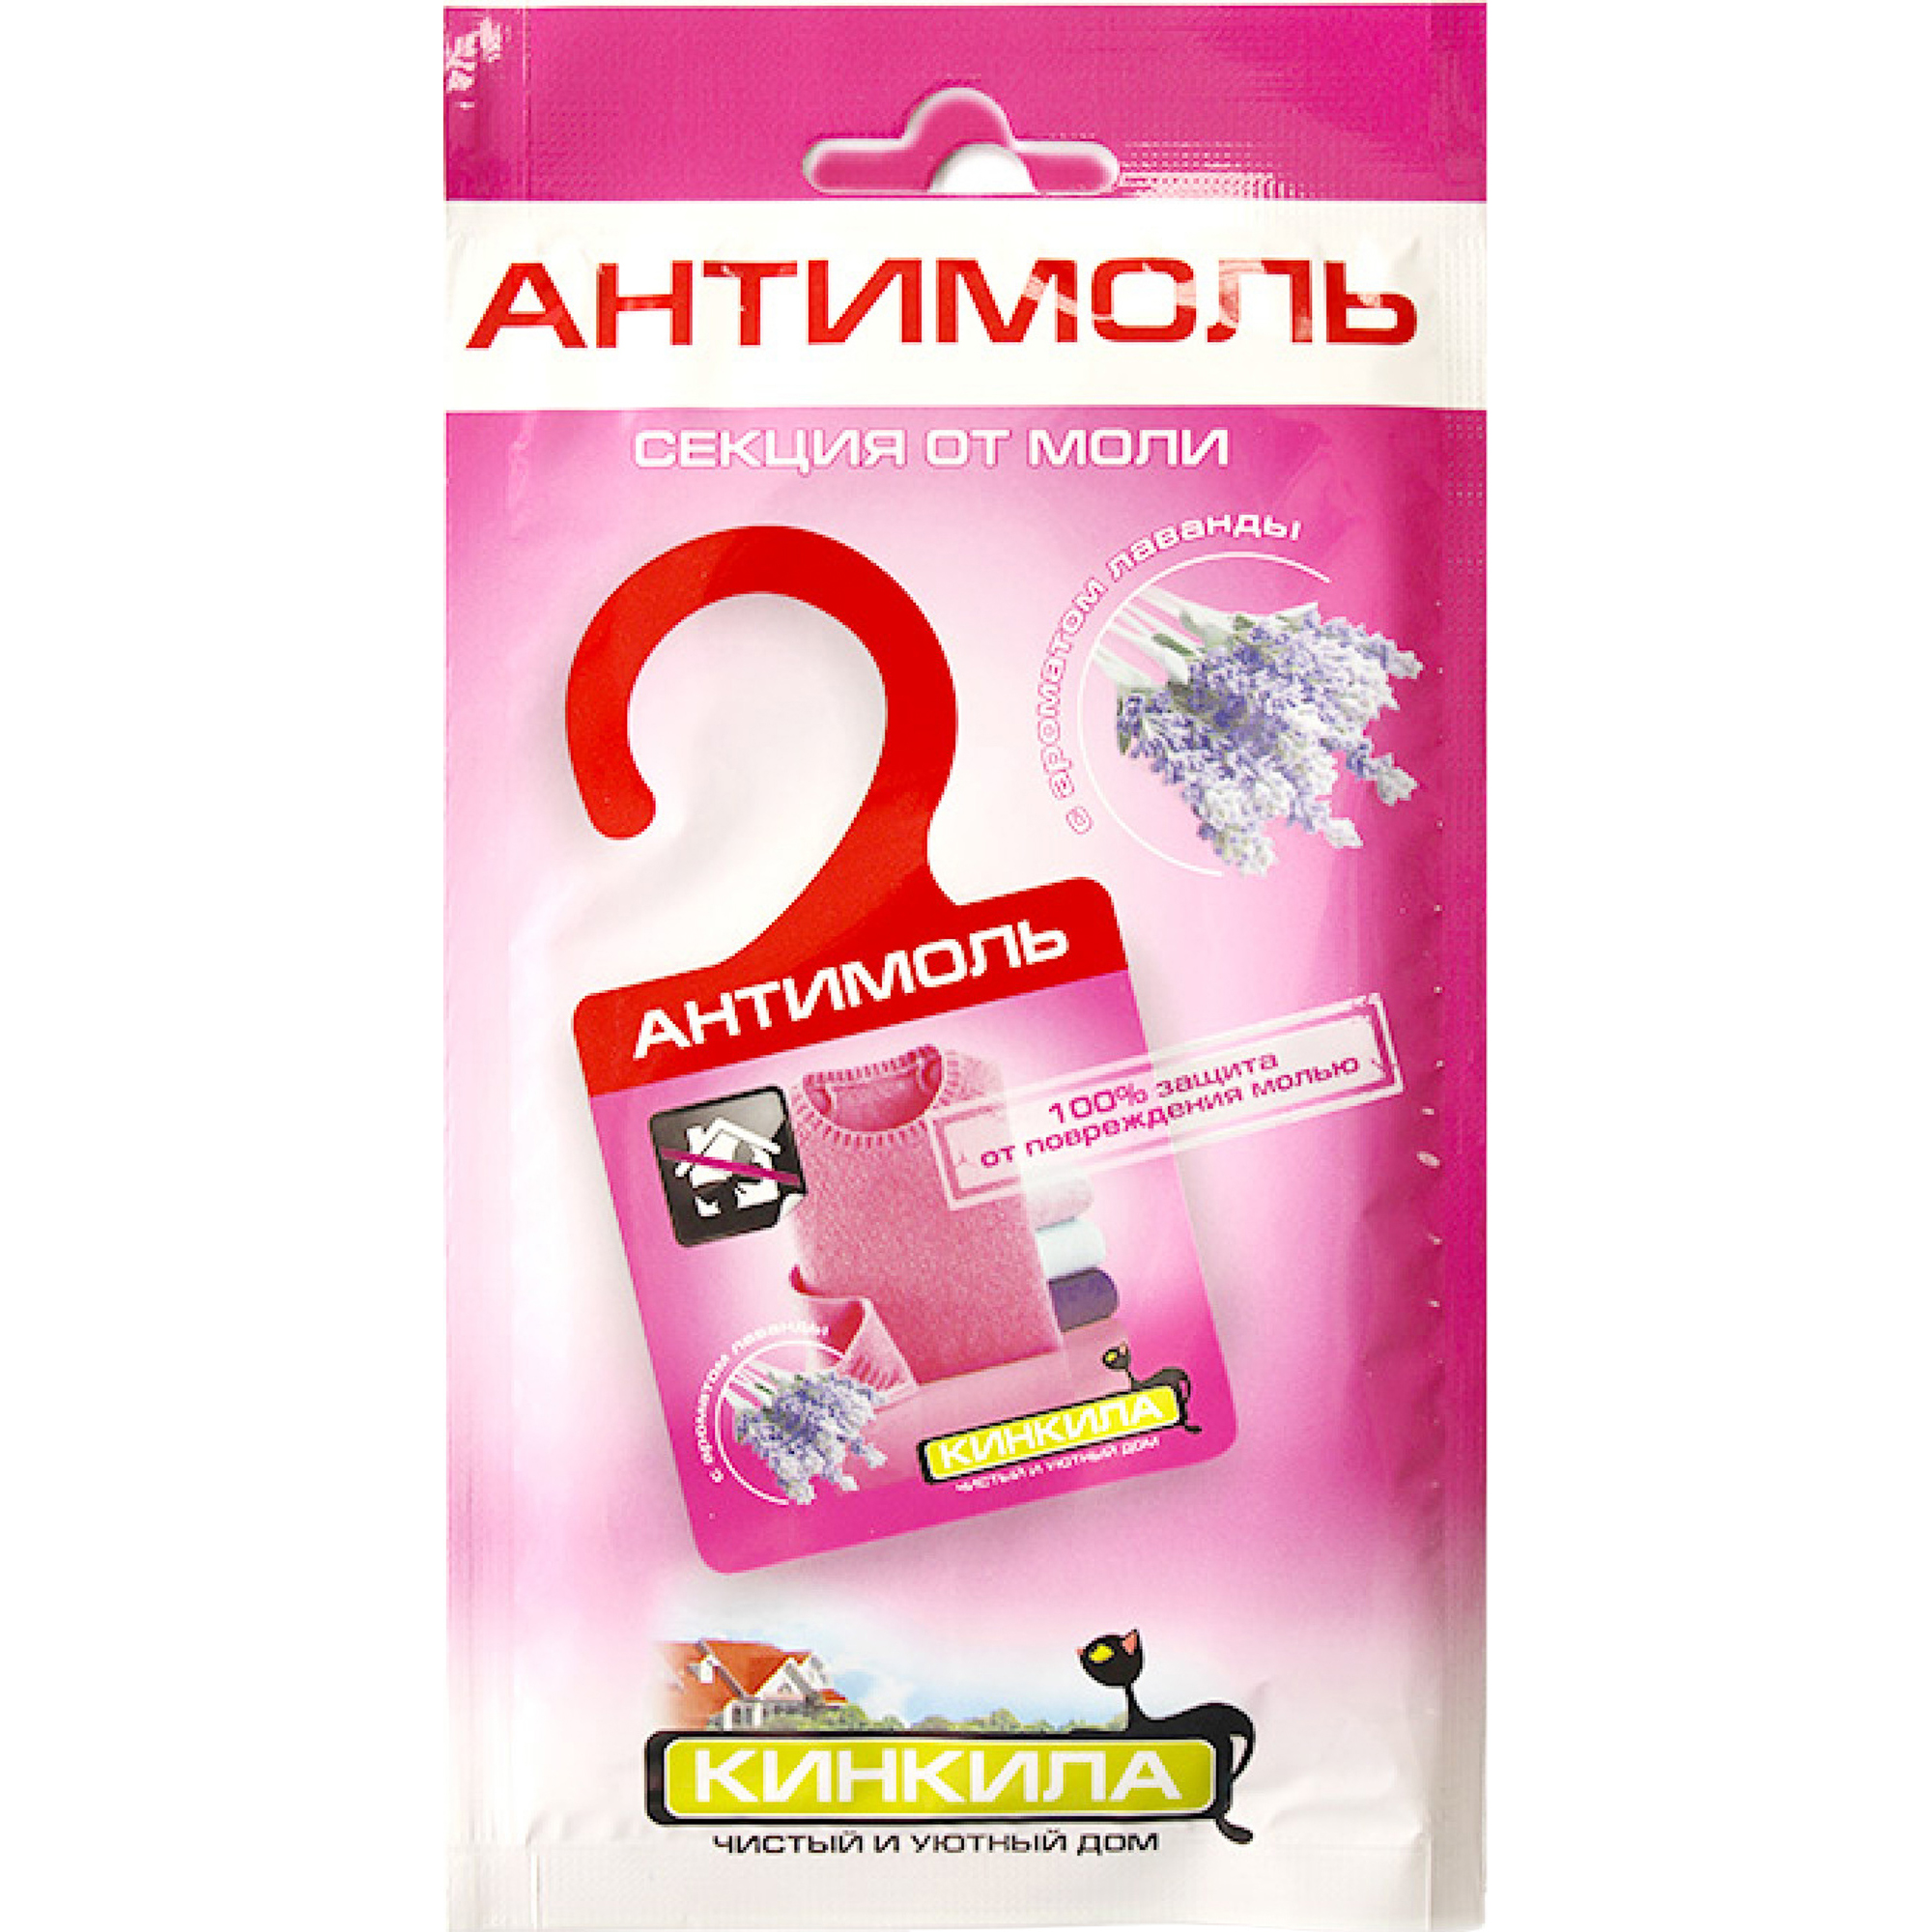 Секция от моли Кинкила Антимоль лаванда средство защиты help секция от моли с ароматом лаванды 80308